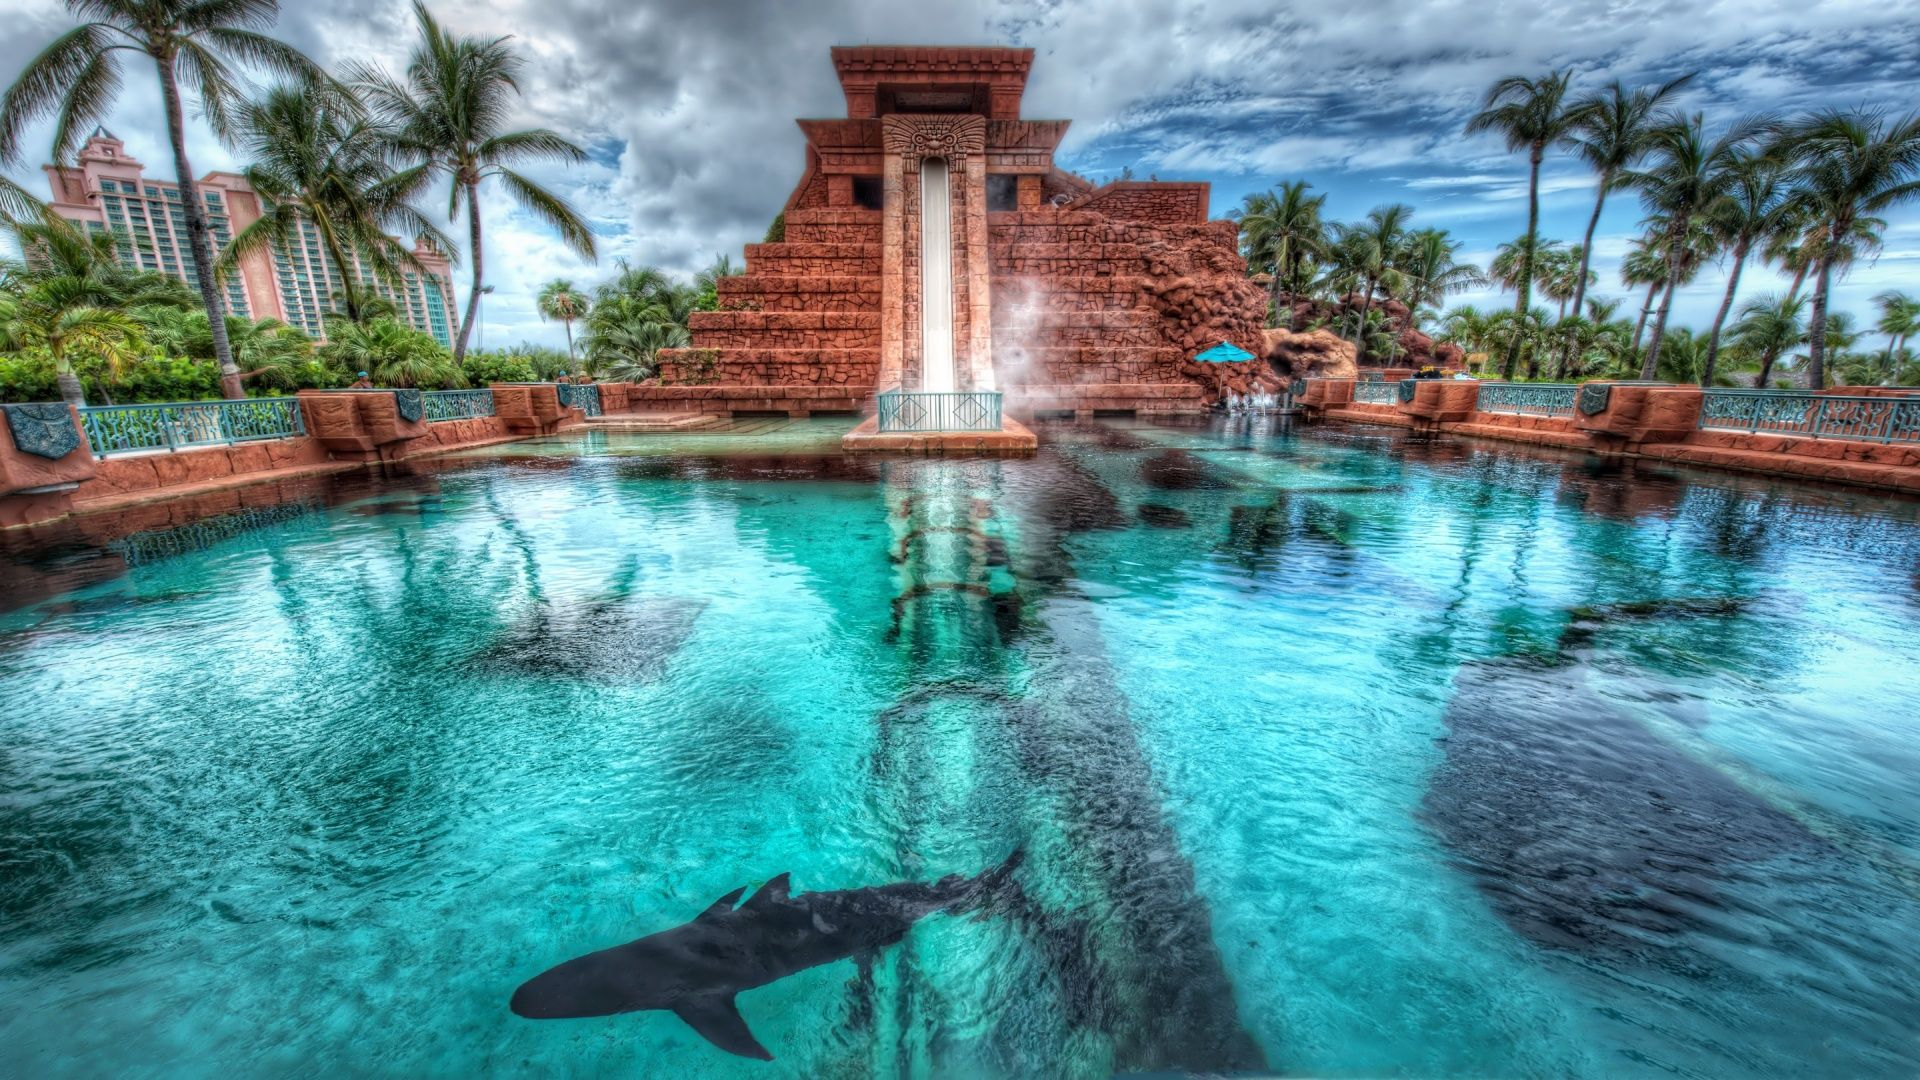 Bahamas wallpaper 1080p